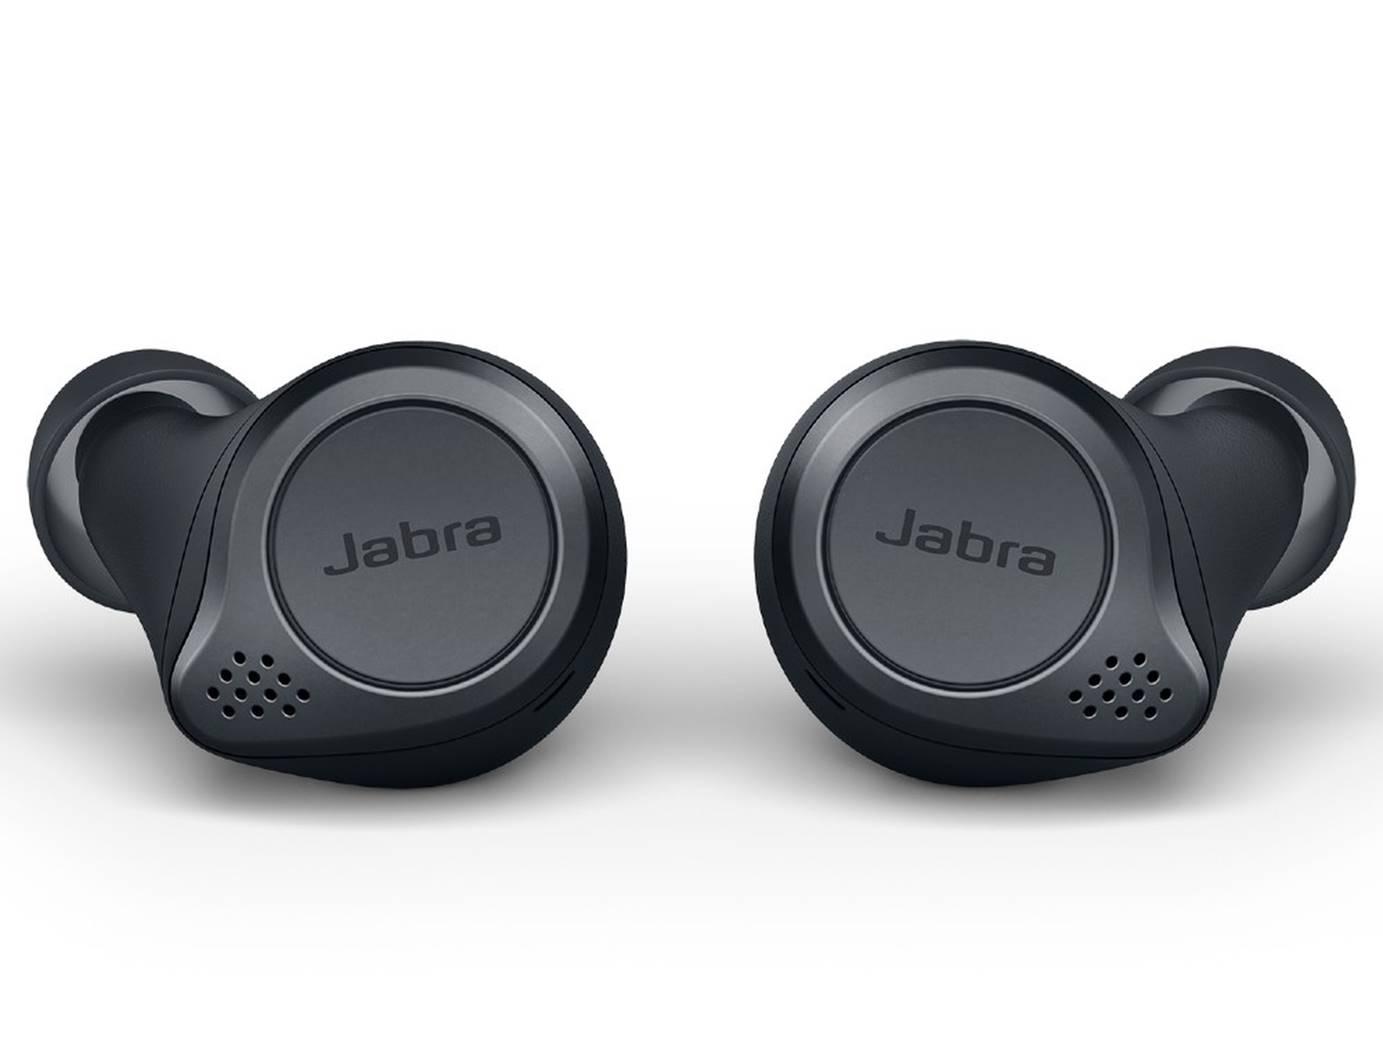 Jabra Elite Active 75t Wireless Earbuds for Running